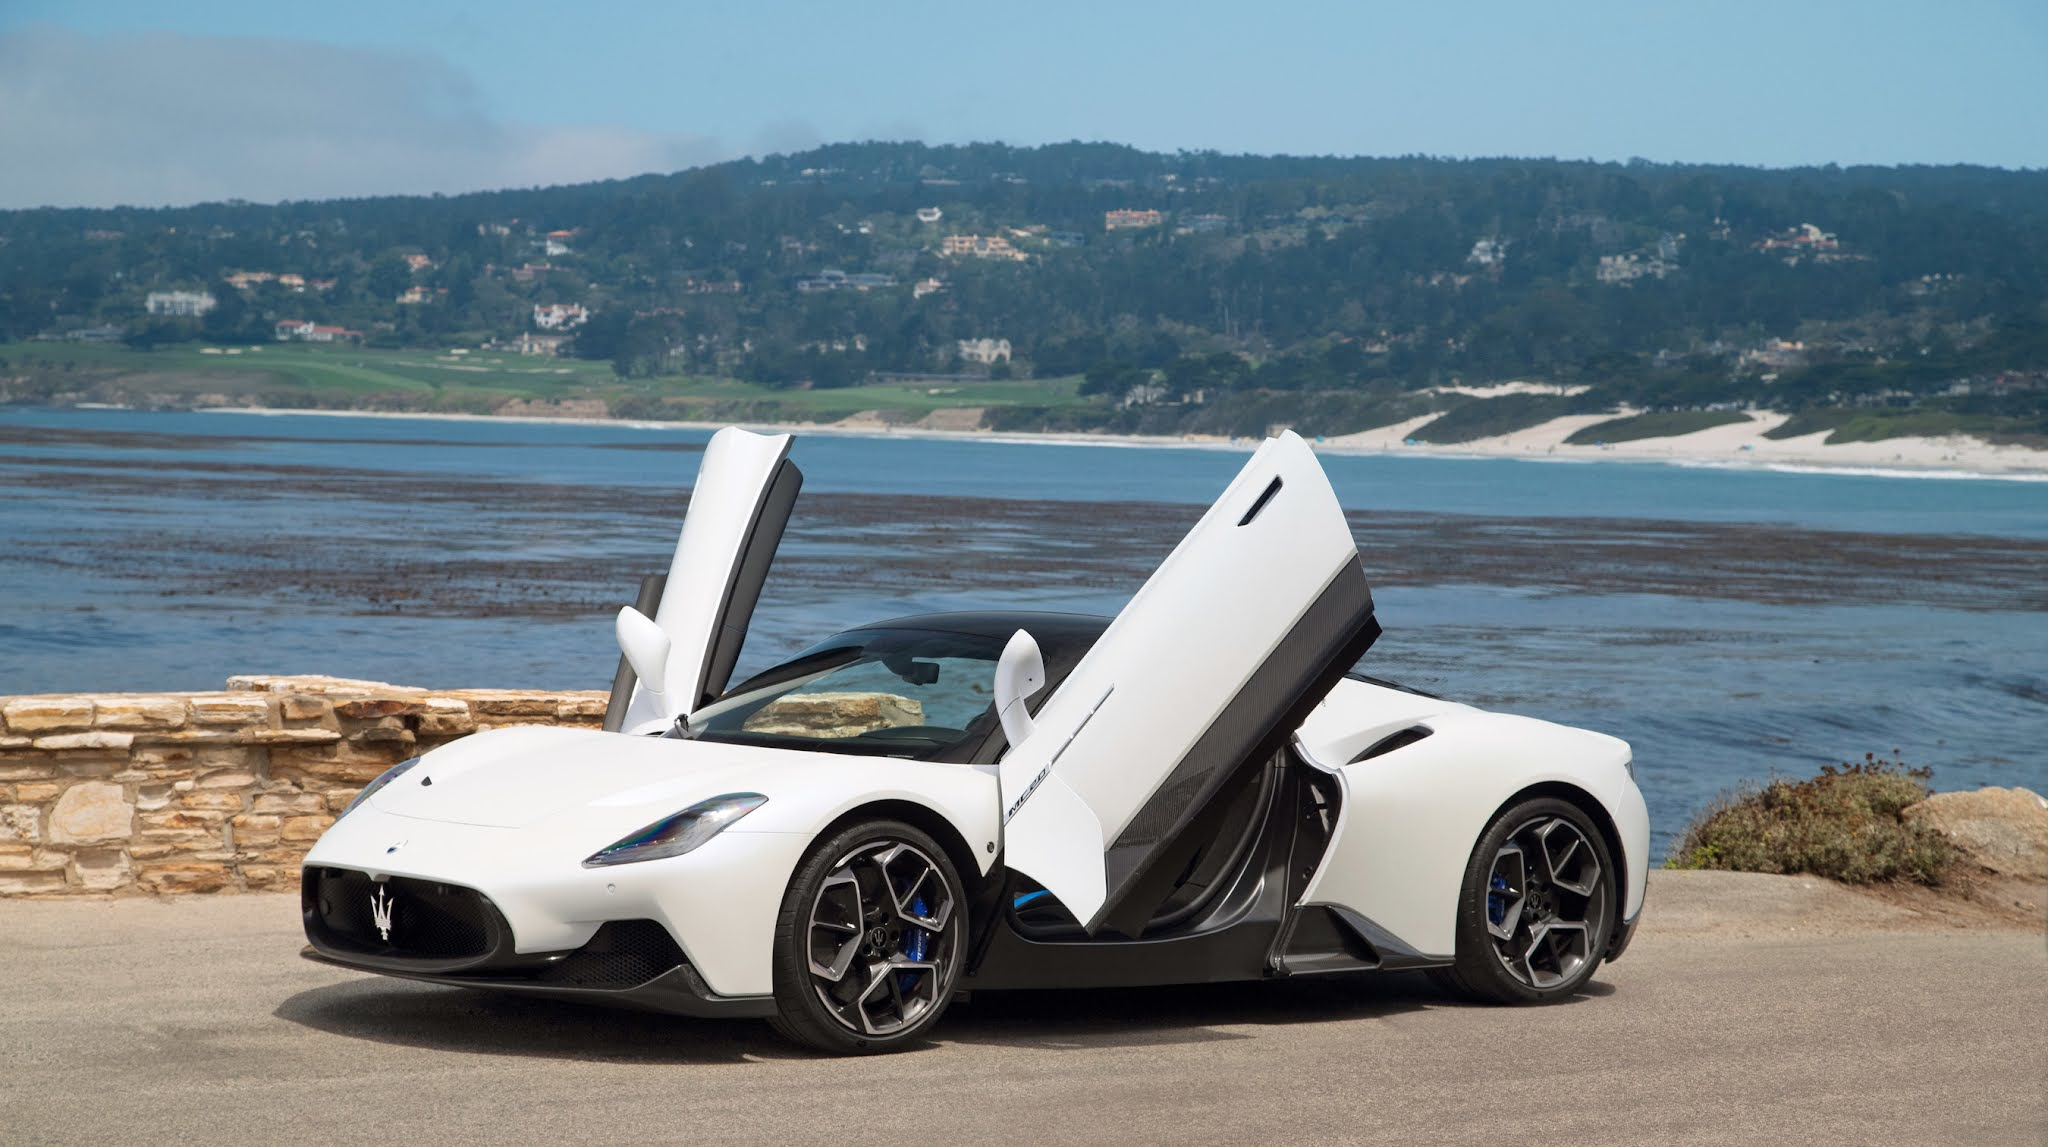 Maserati MC20 Dazzles on Pebble Beach Concept Lawn as Monterey Car Week Returns for 2021